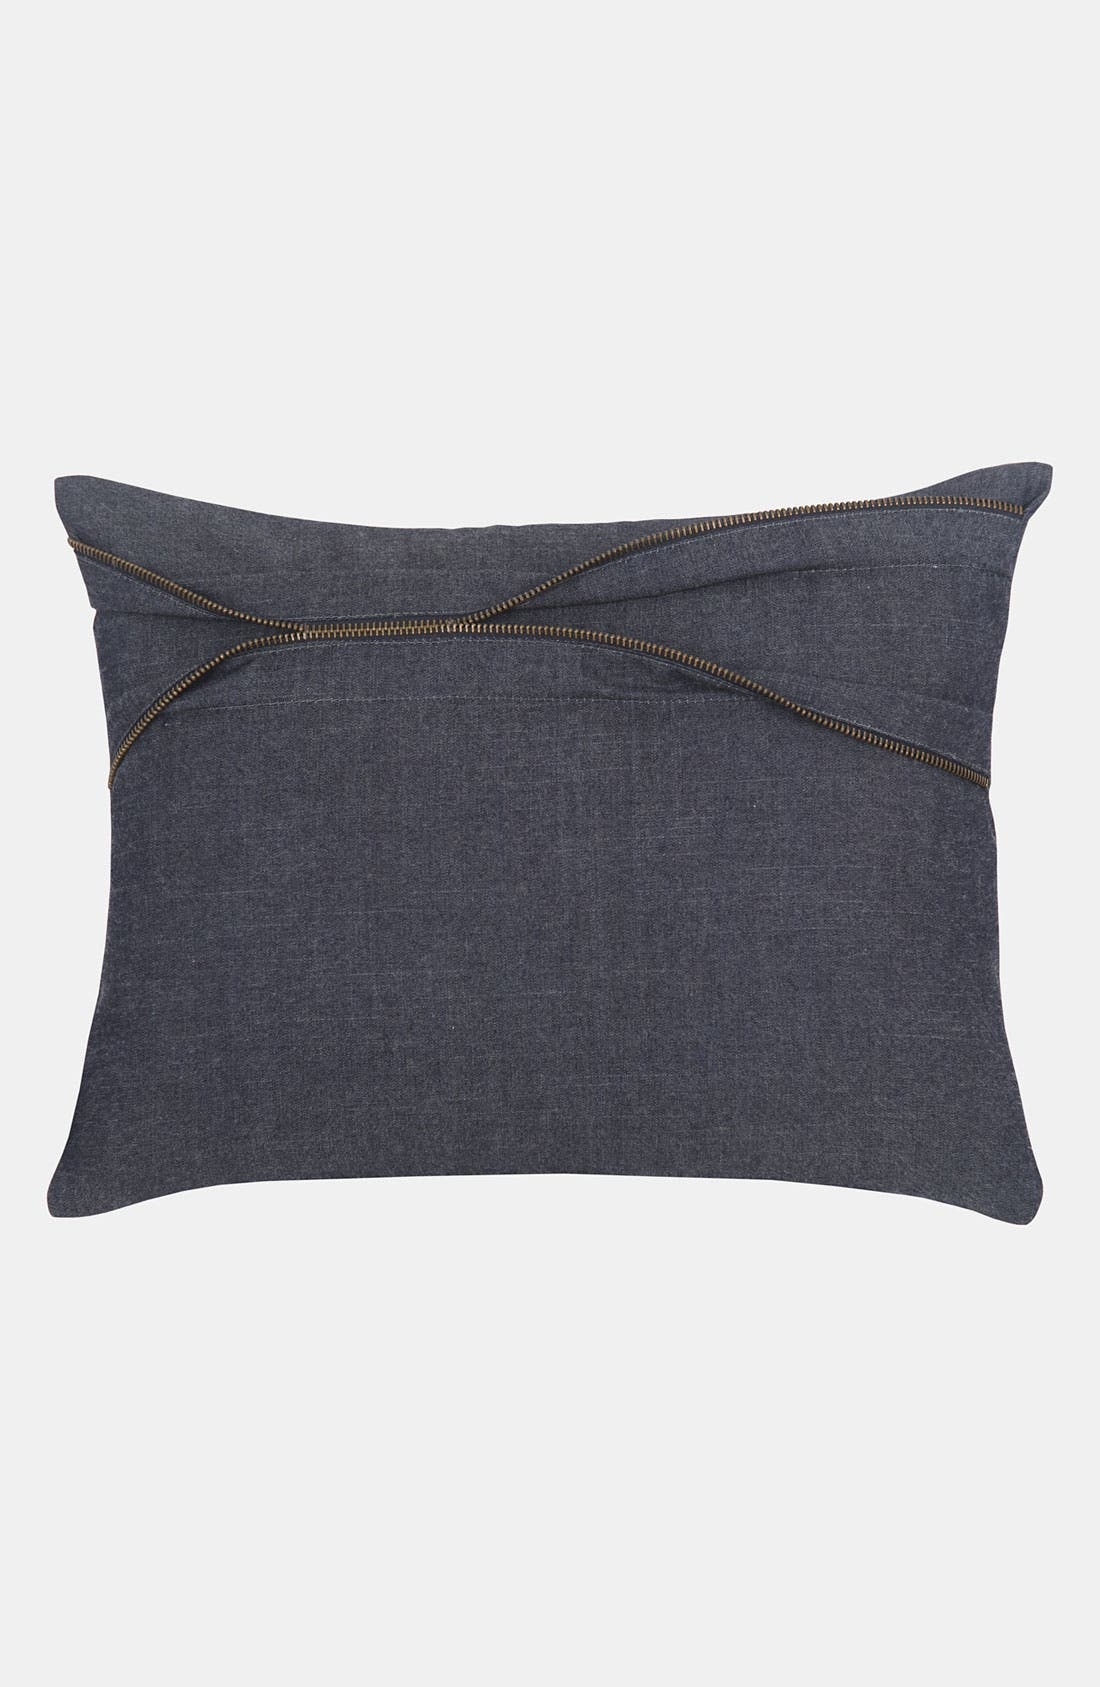 Main Image - Blissliving Home Denim Pillow (Online Only)